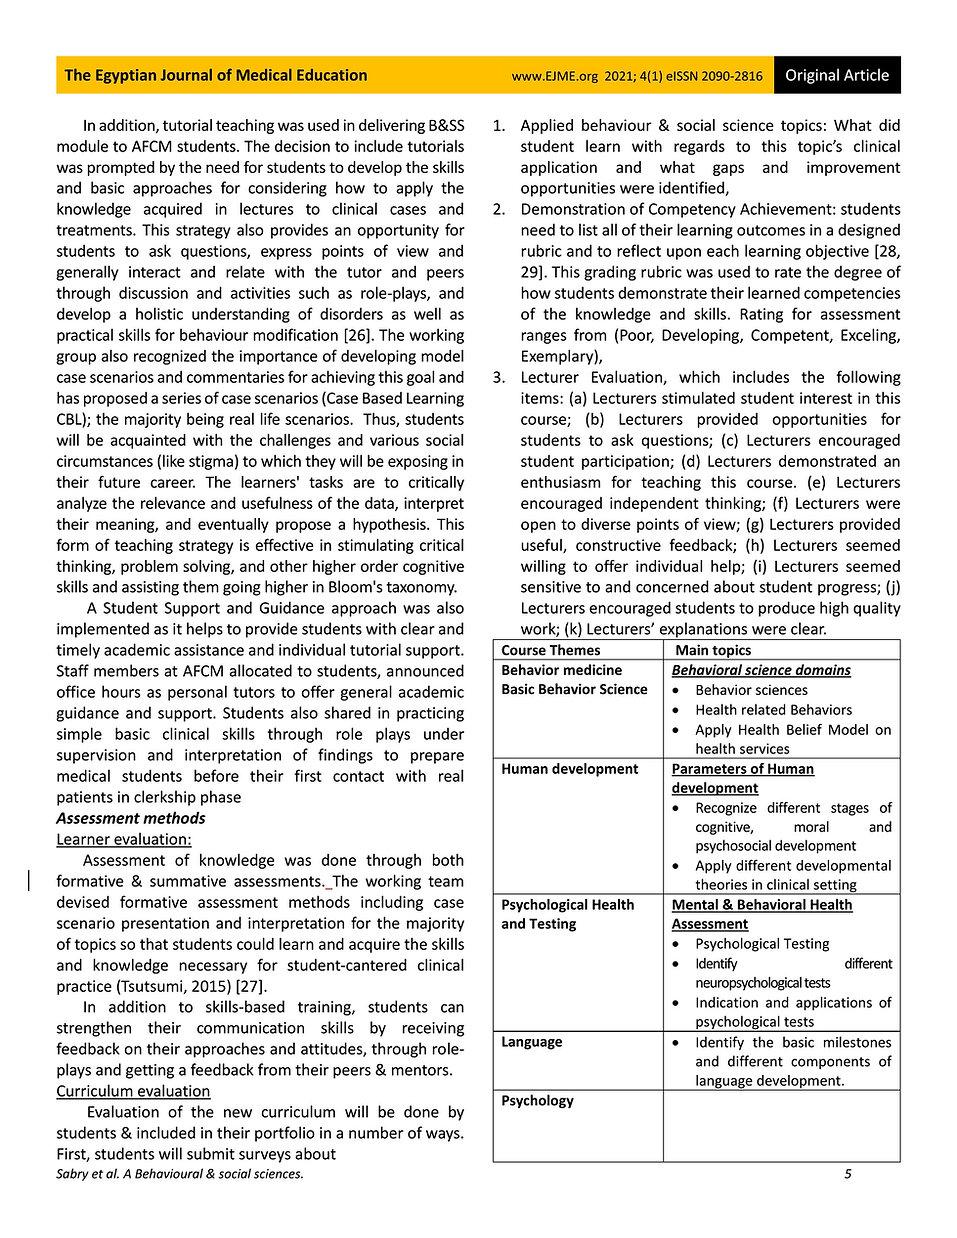 B&SS paper EJME template_5.jpg